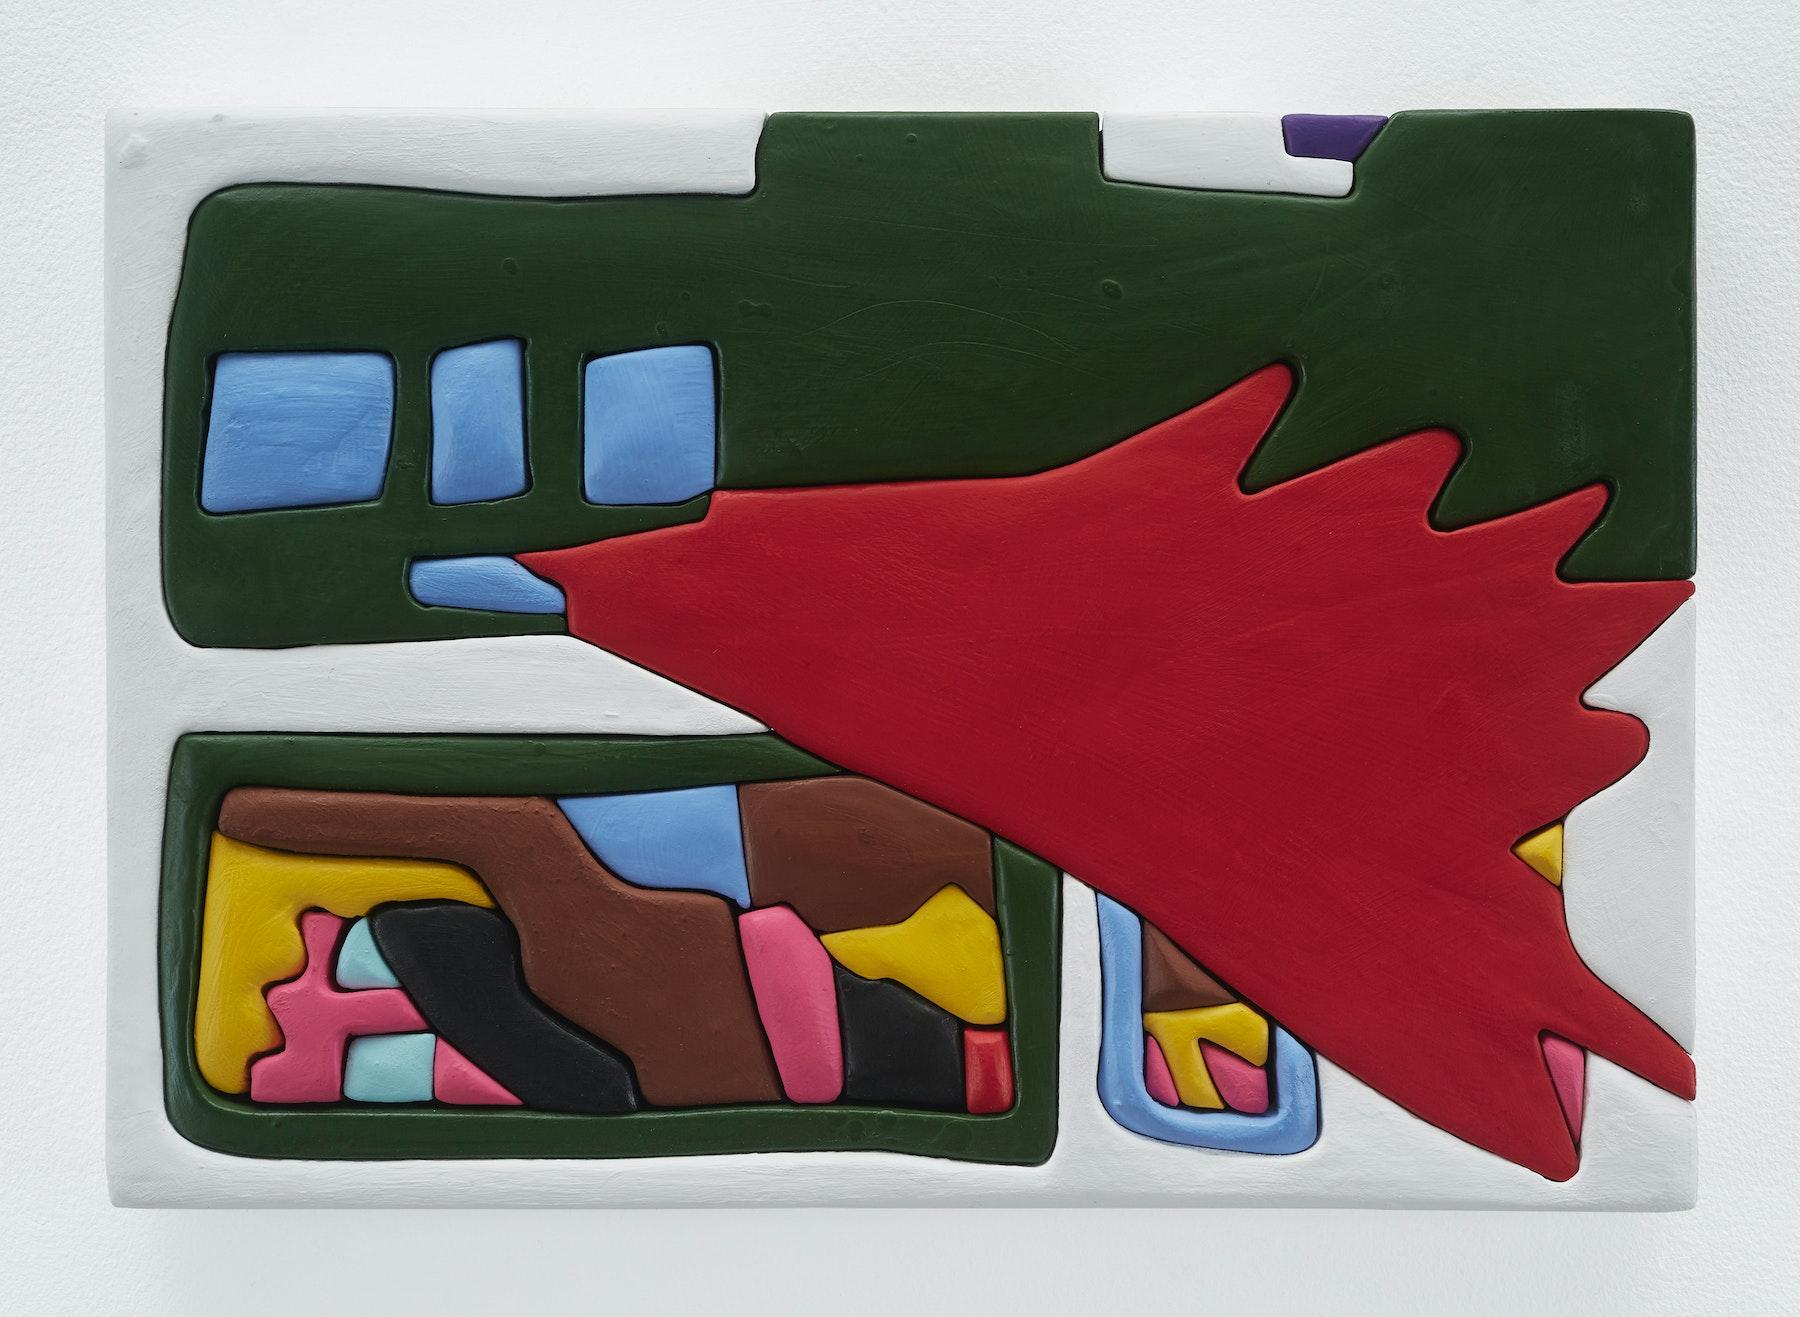 "Sadie Benning ""Untitled 11x16 (WW),"" 2019 Wood, aqua resin, casein, and acrylic gouache 11 x 16"" [HxW] (27.94 x 40.64 cm) Inventory #BEN850 Courtesy of the artist and Vielmetter Los Angeles Photocredit: Chris Austin"